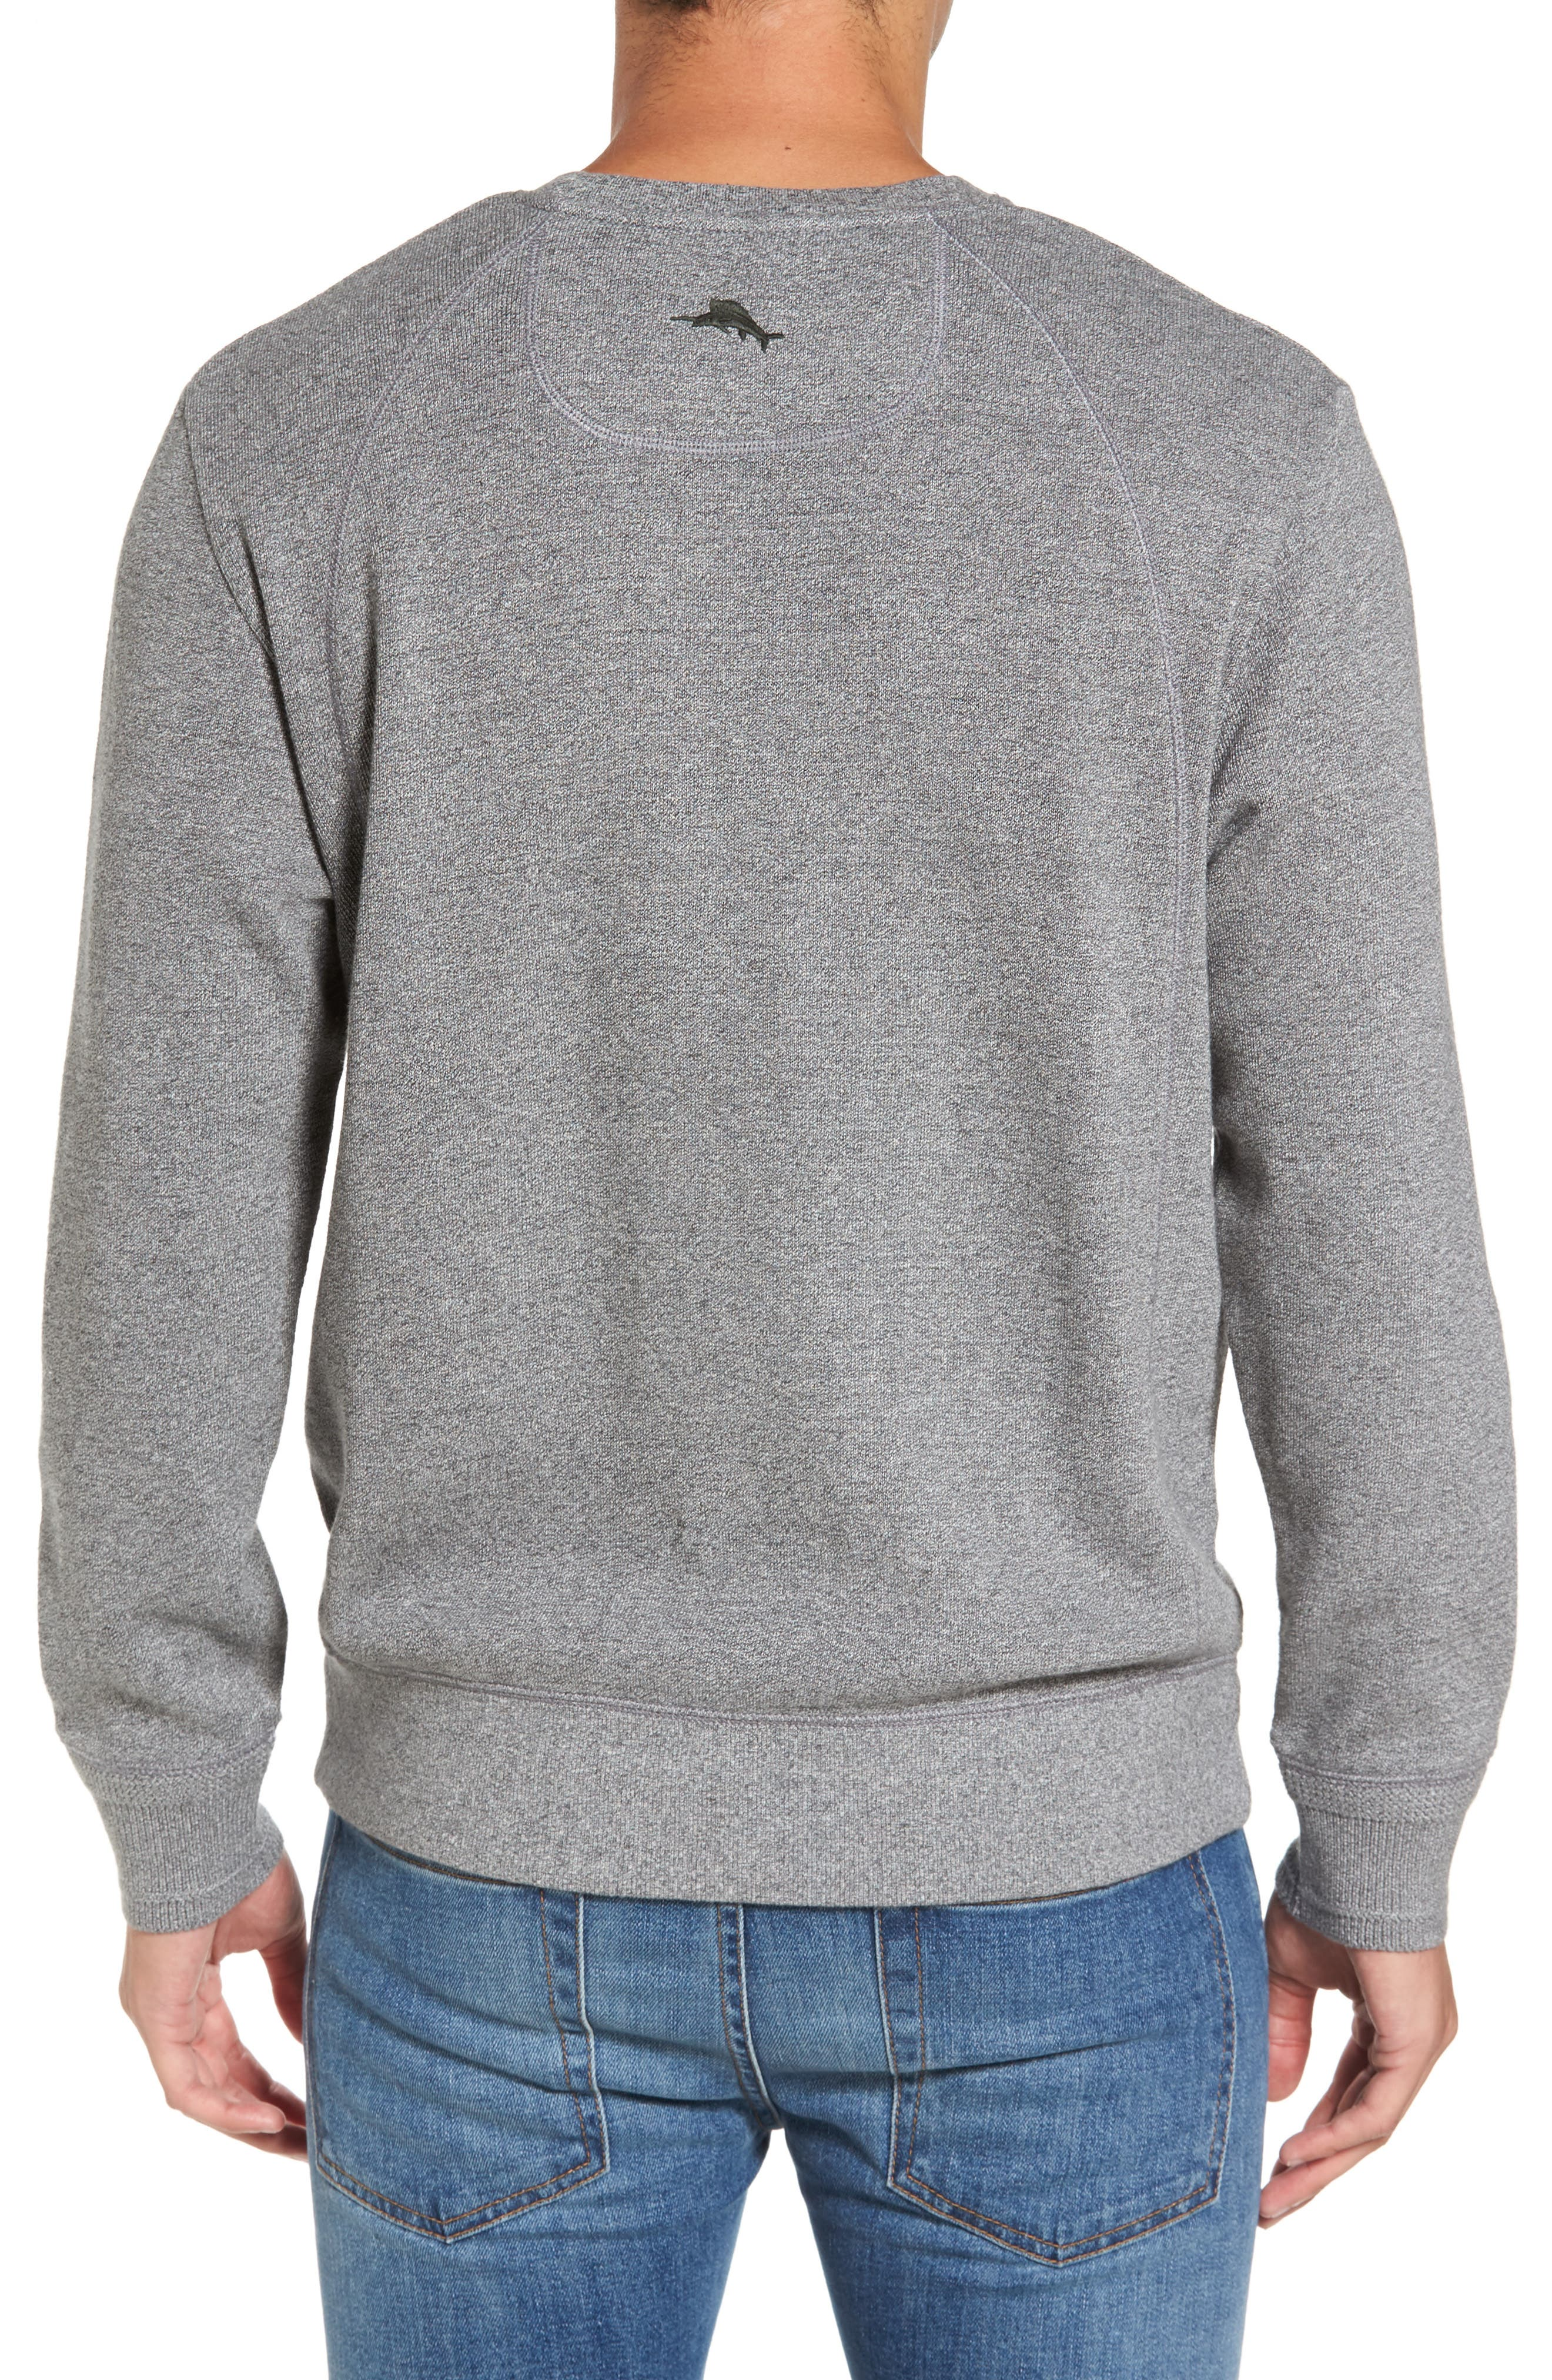 NFL Stitch of Liberty Embroidered Crewneck Sweatshirt,                             Alternate thumbnail 49, color,